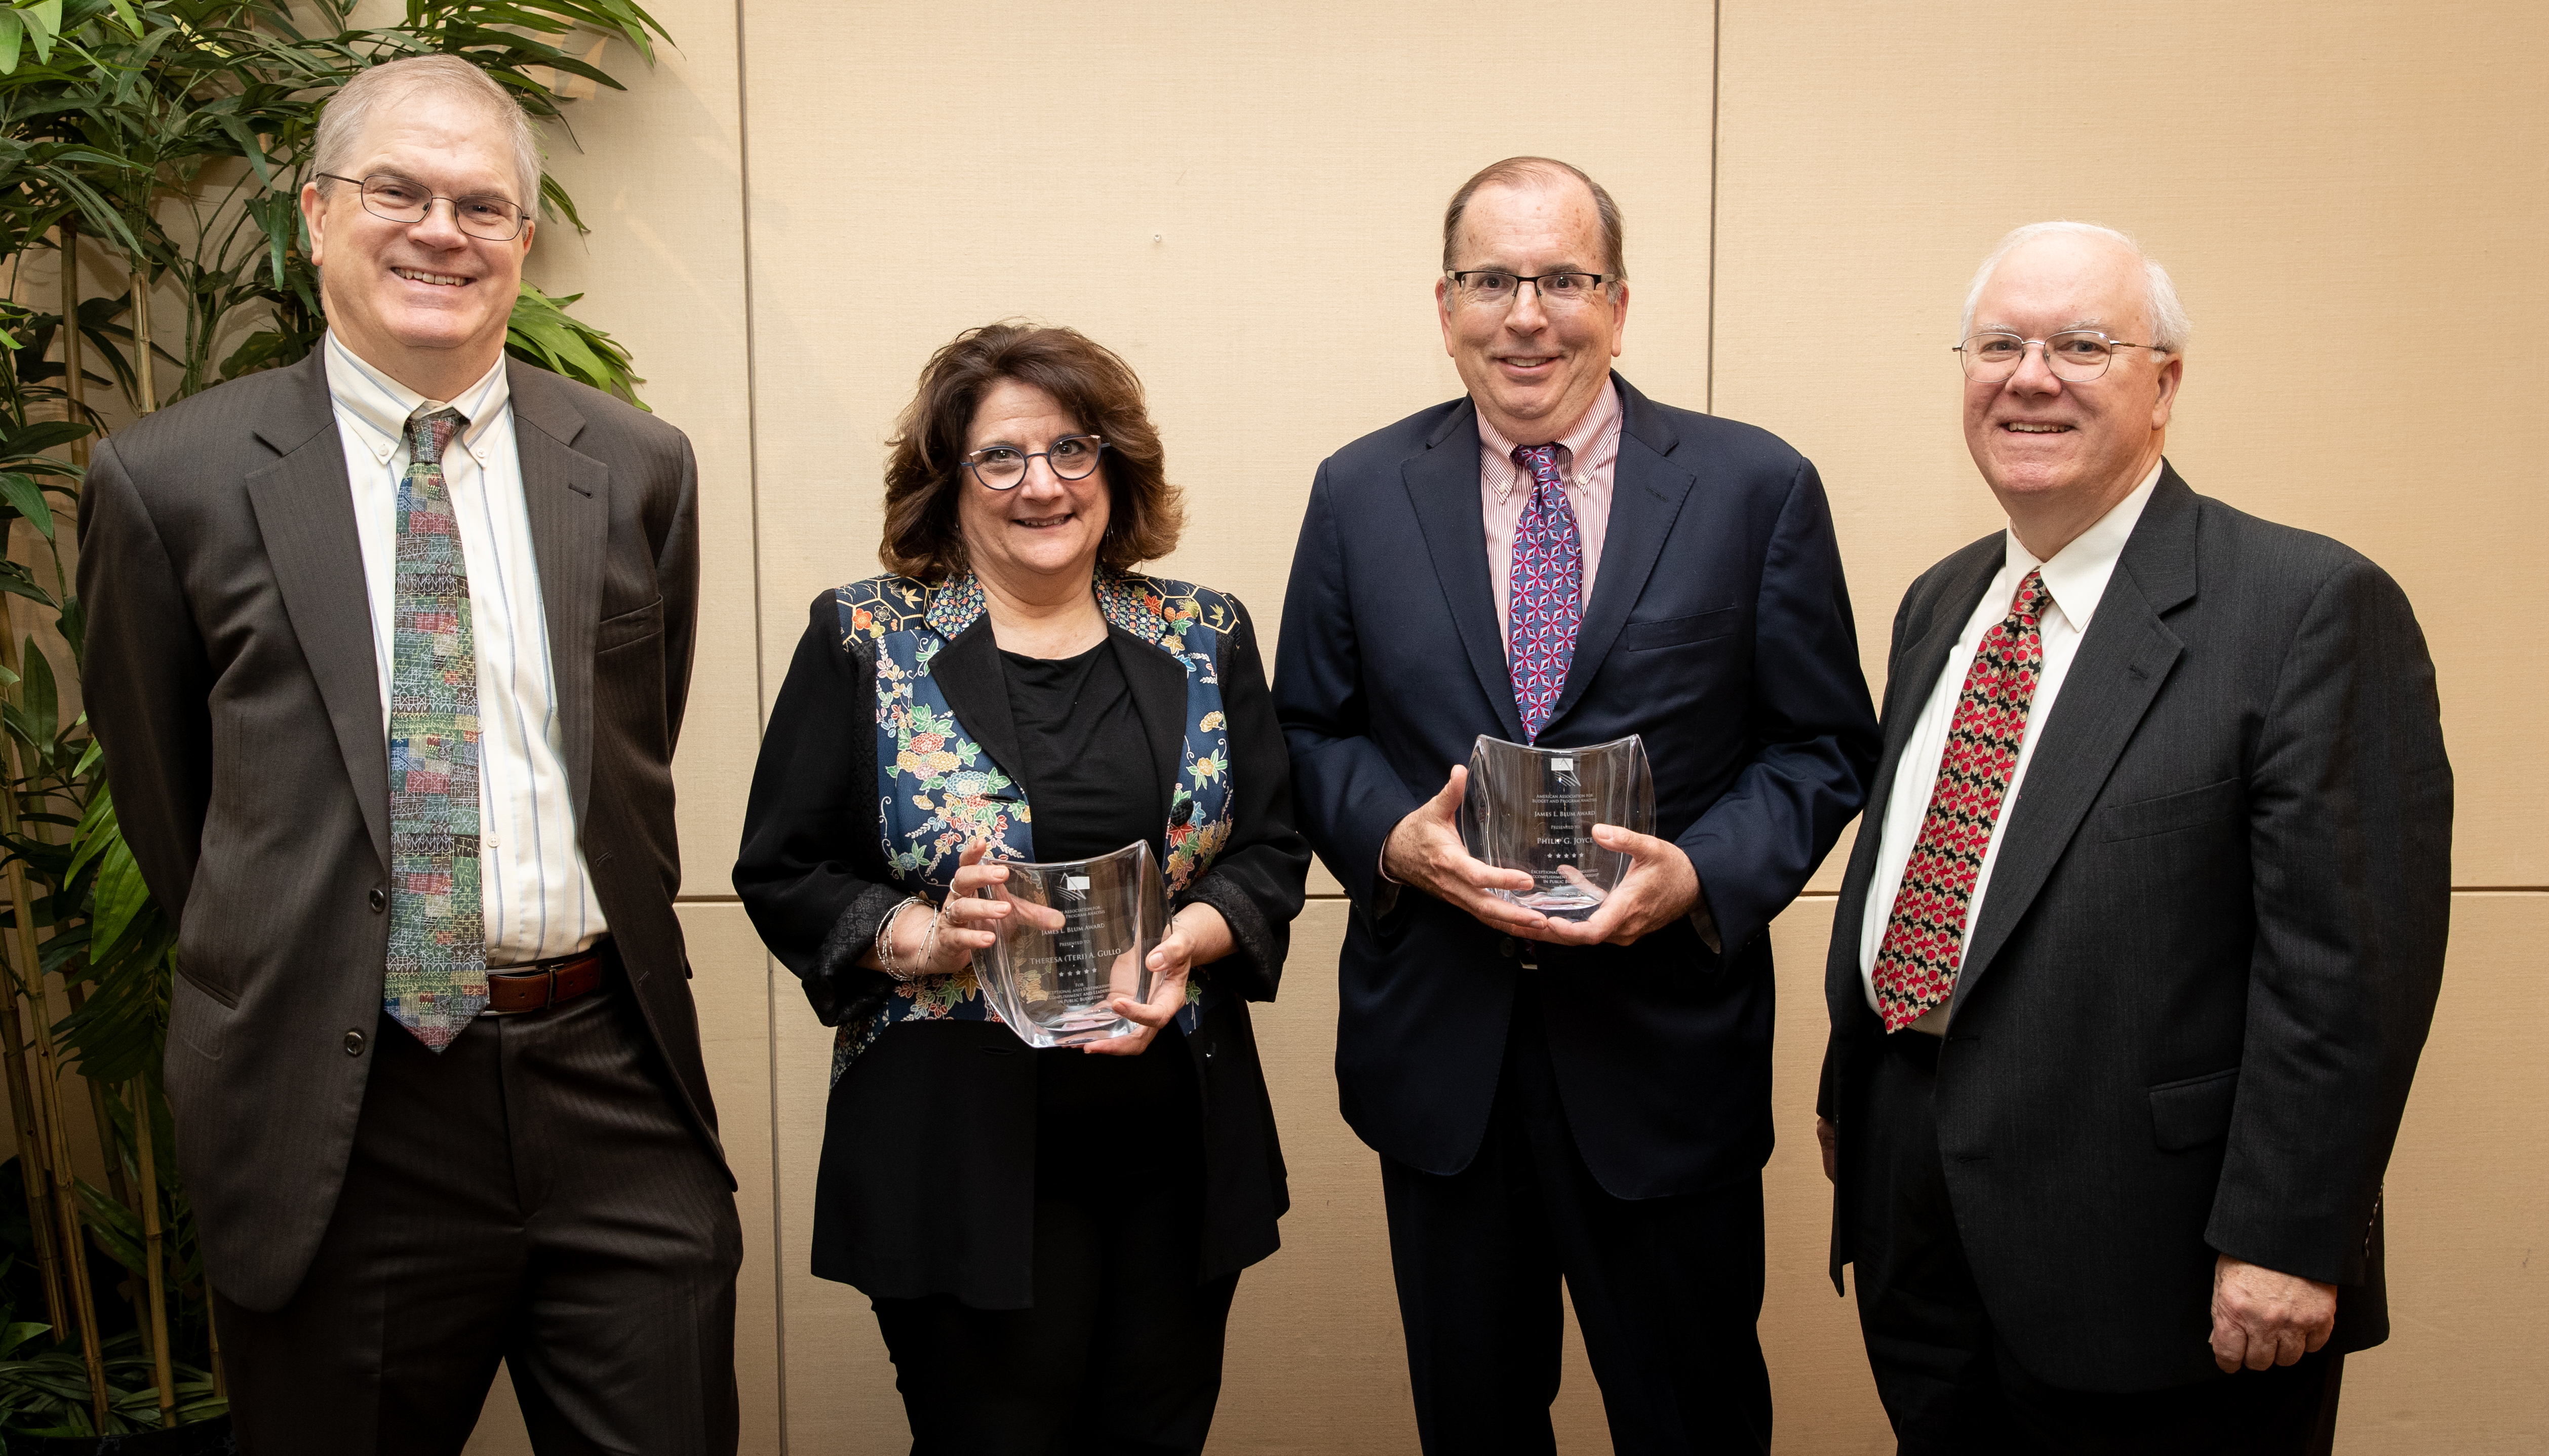 Blum Award